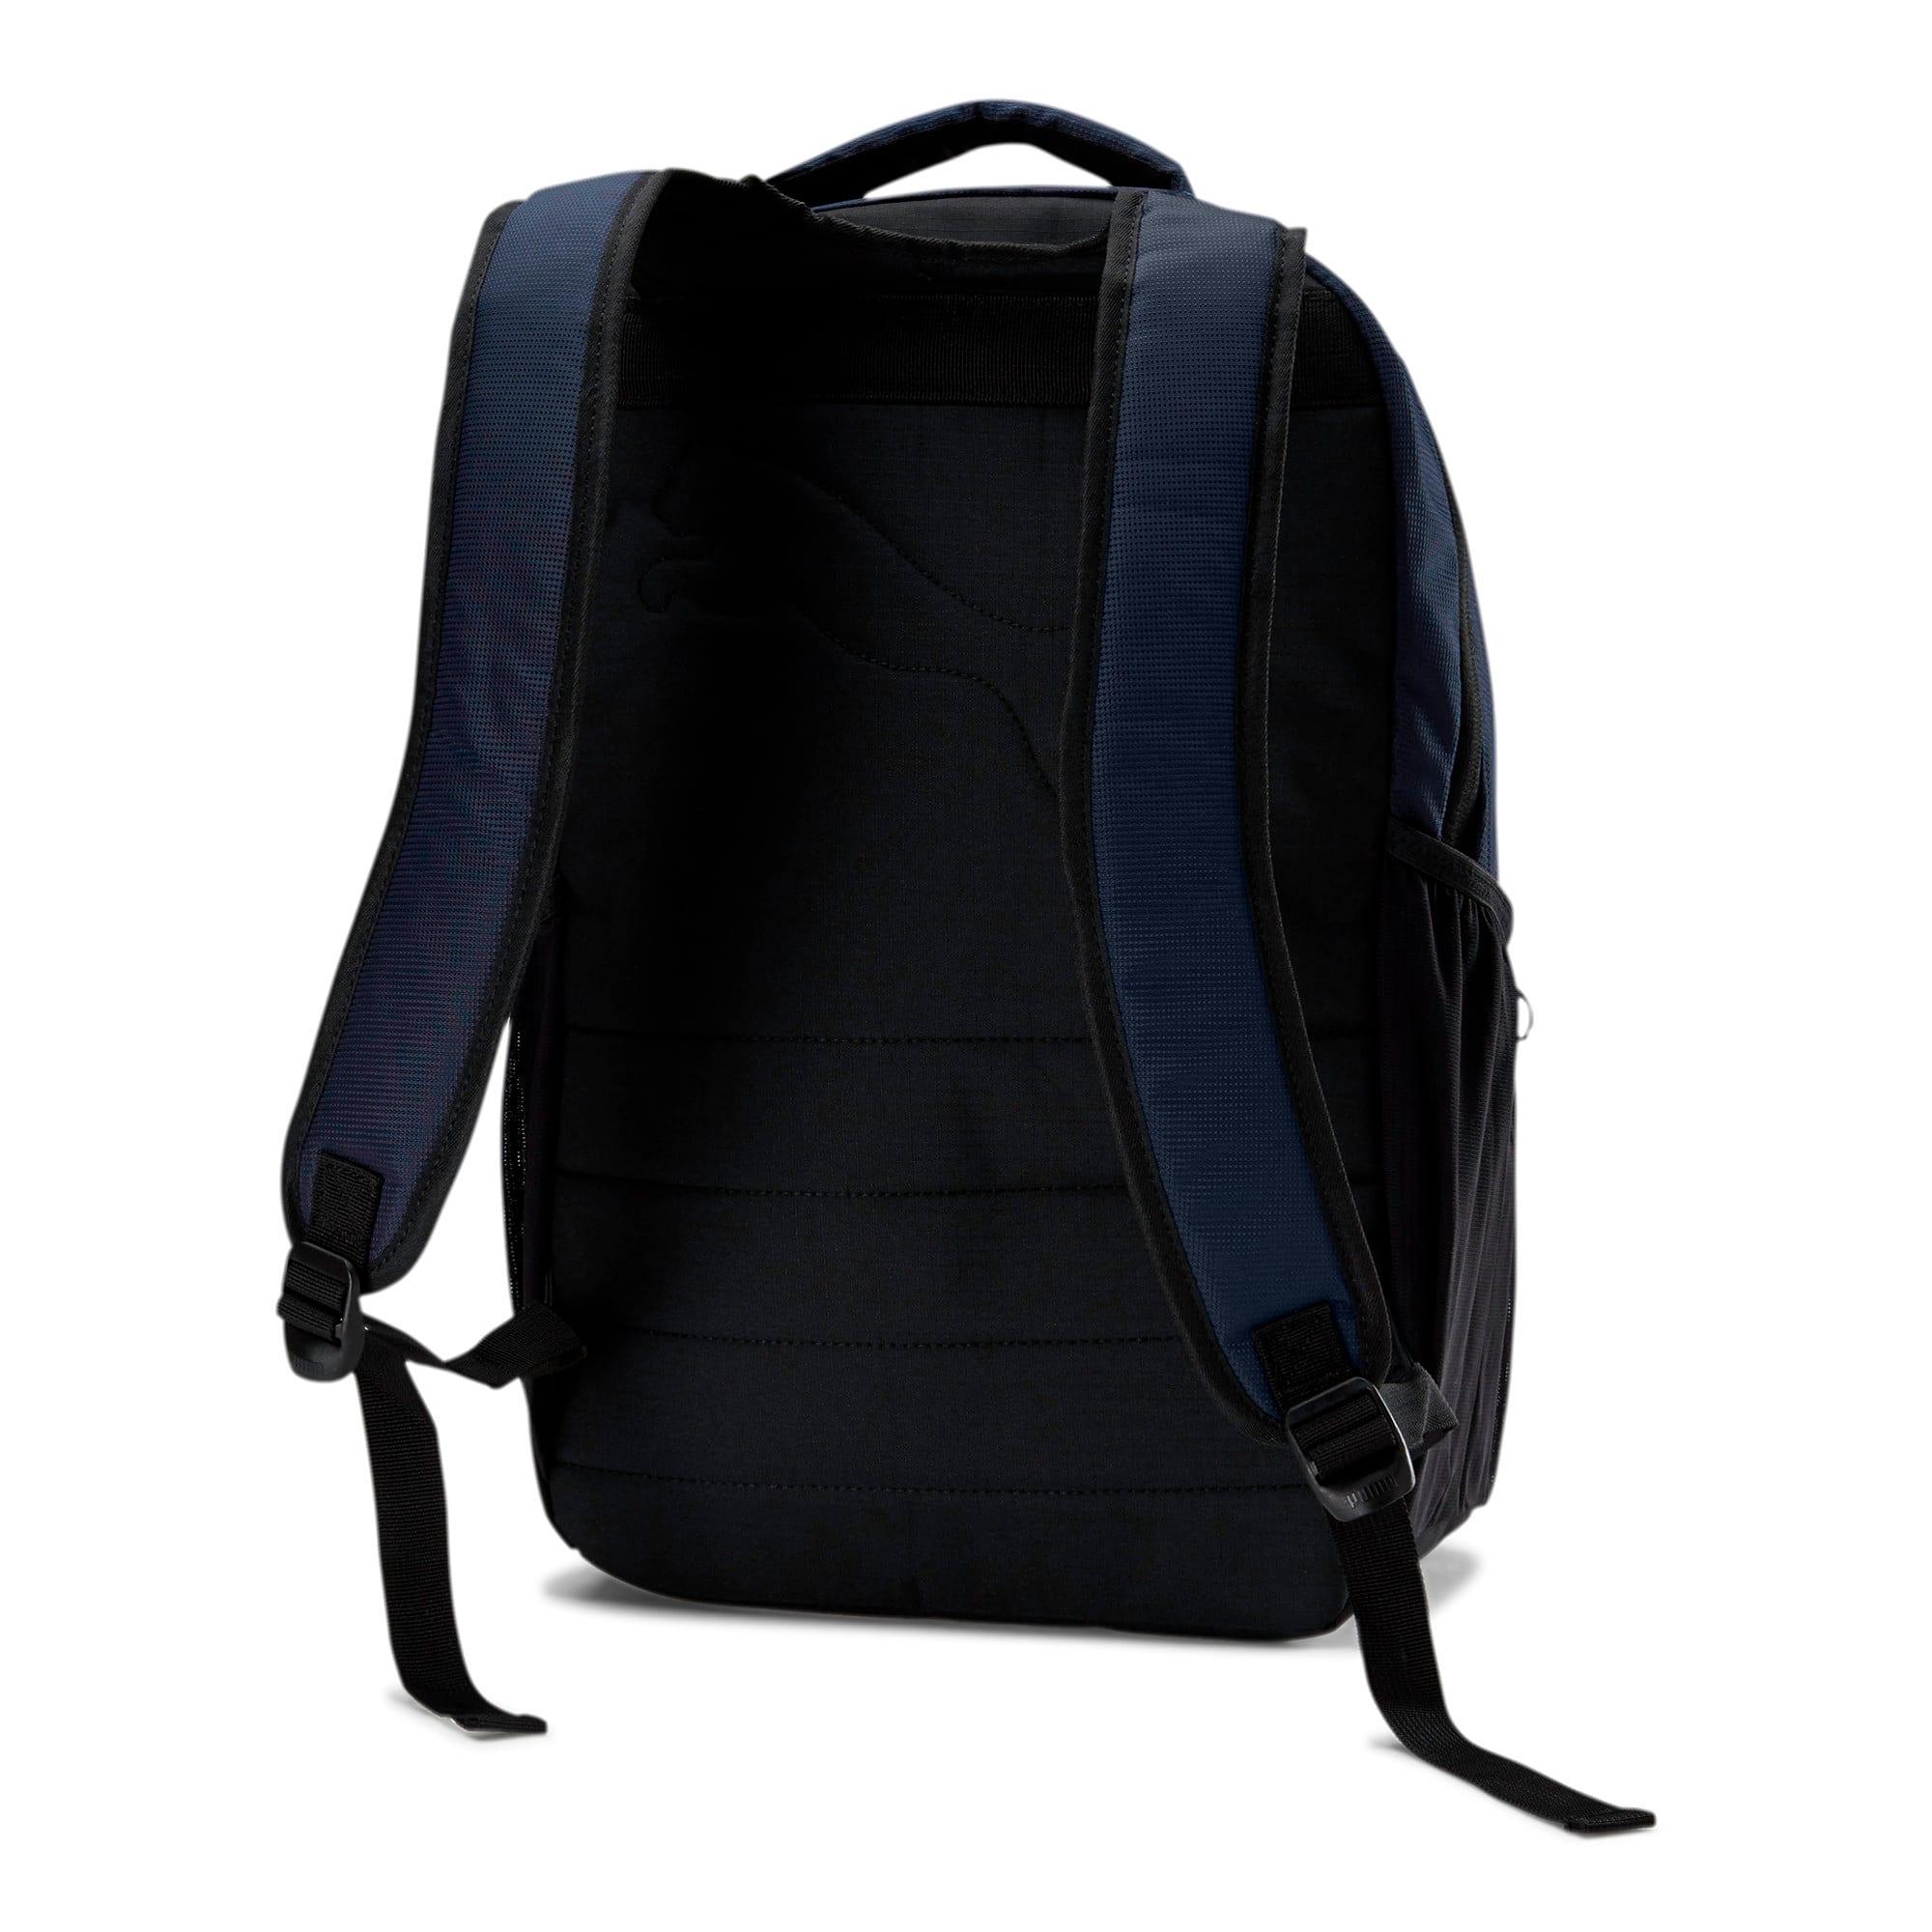 Thumbnail 2 of Formation 2.0 Ball Backpack, Navy, medium